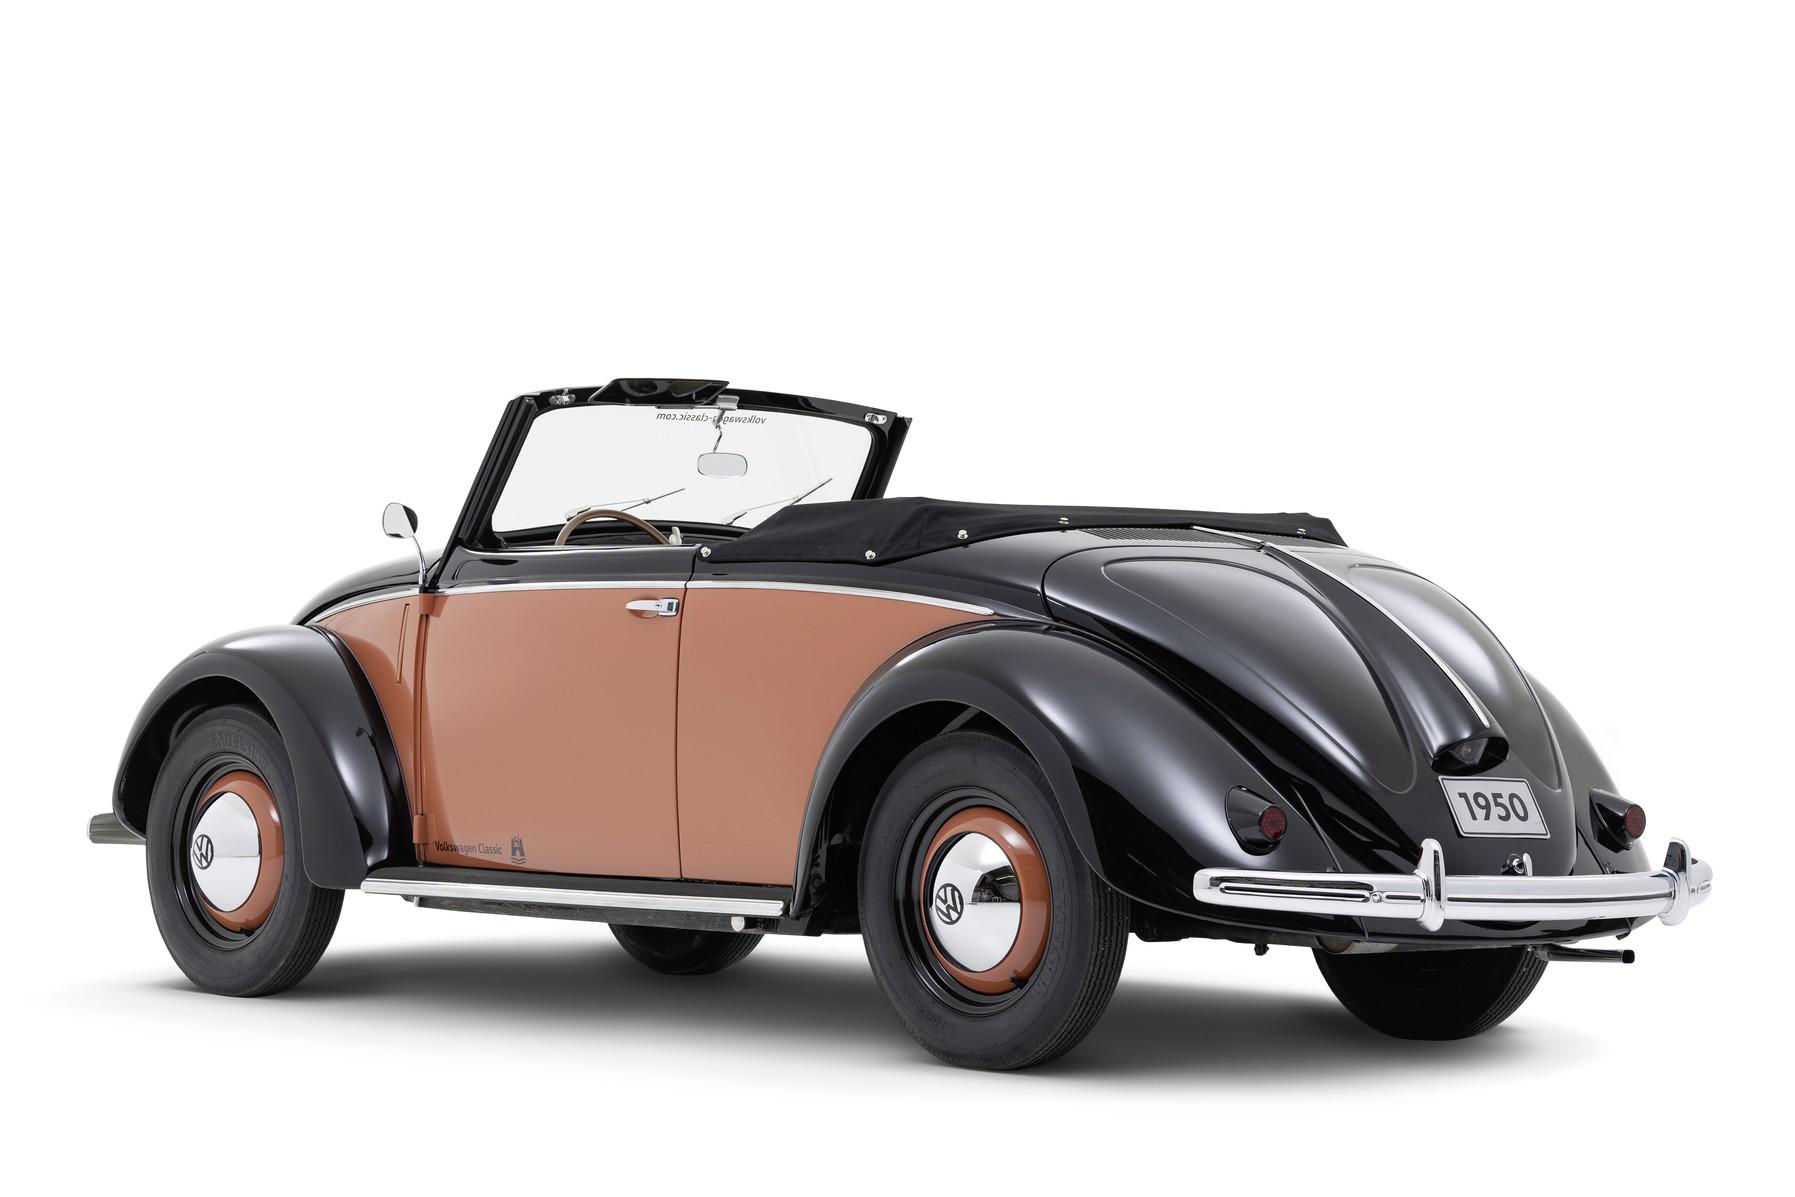 Volkswagen 1100 Hebmüller Cabriolet (1950)